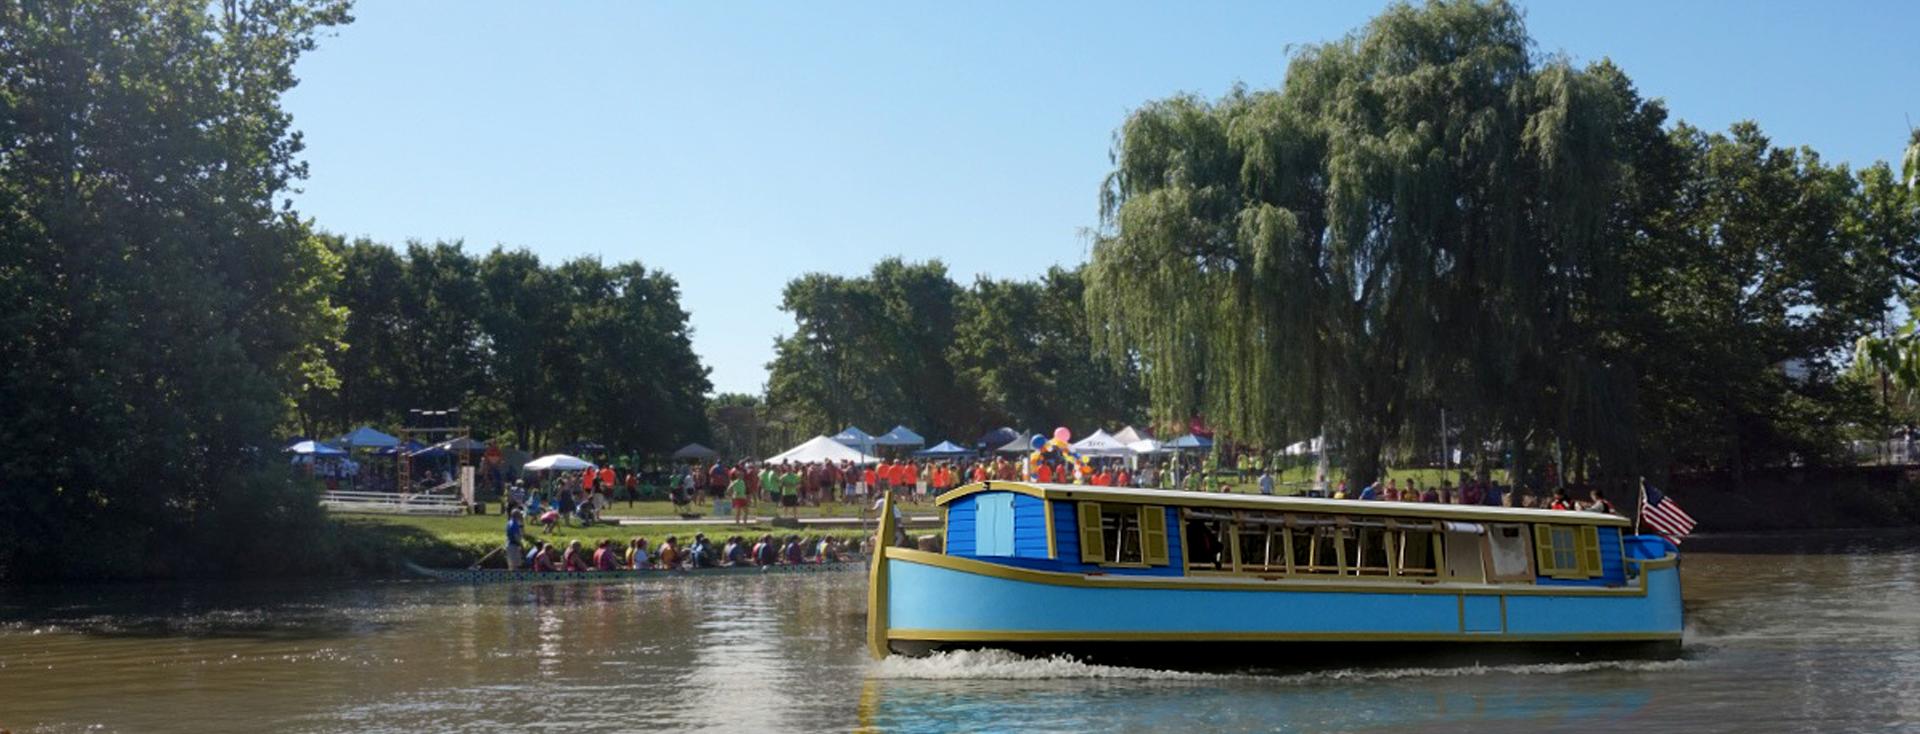 Riverfront Fort Wayne Visit Fort Wayne - May river excursions